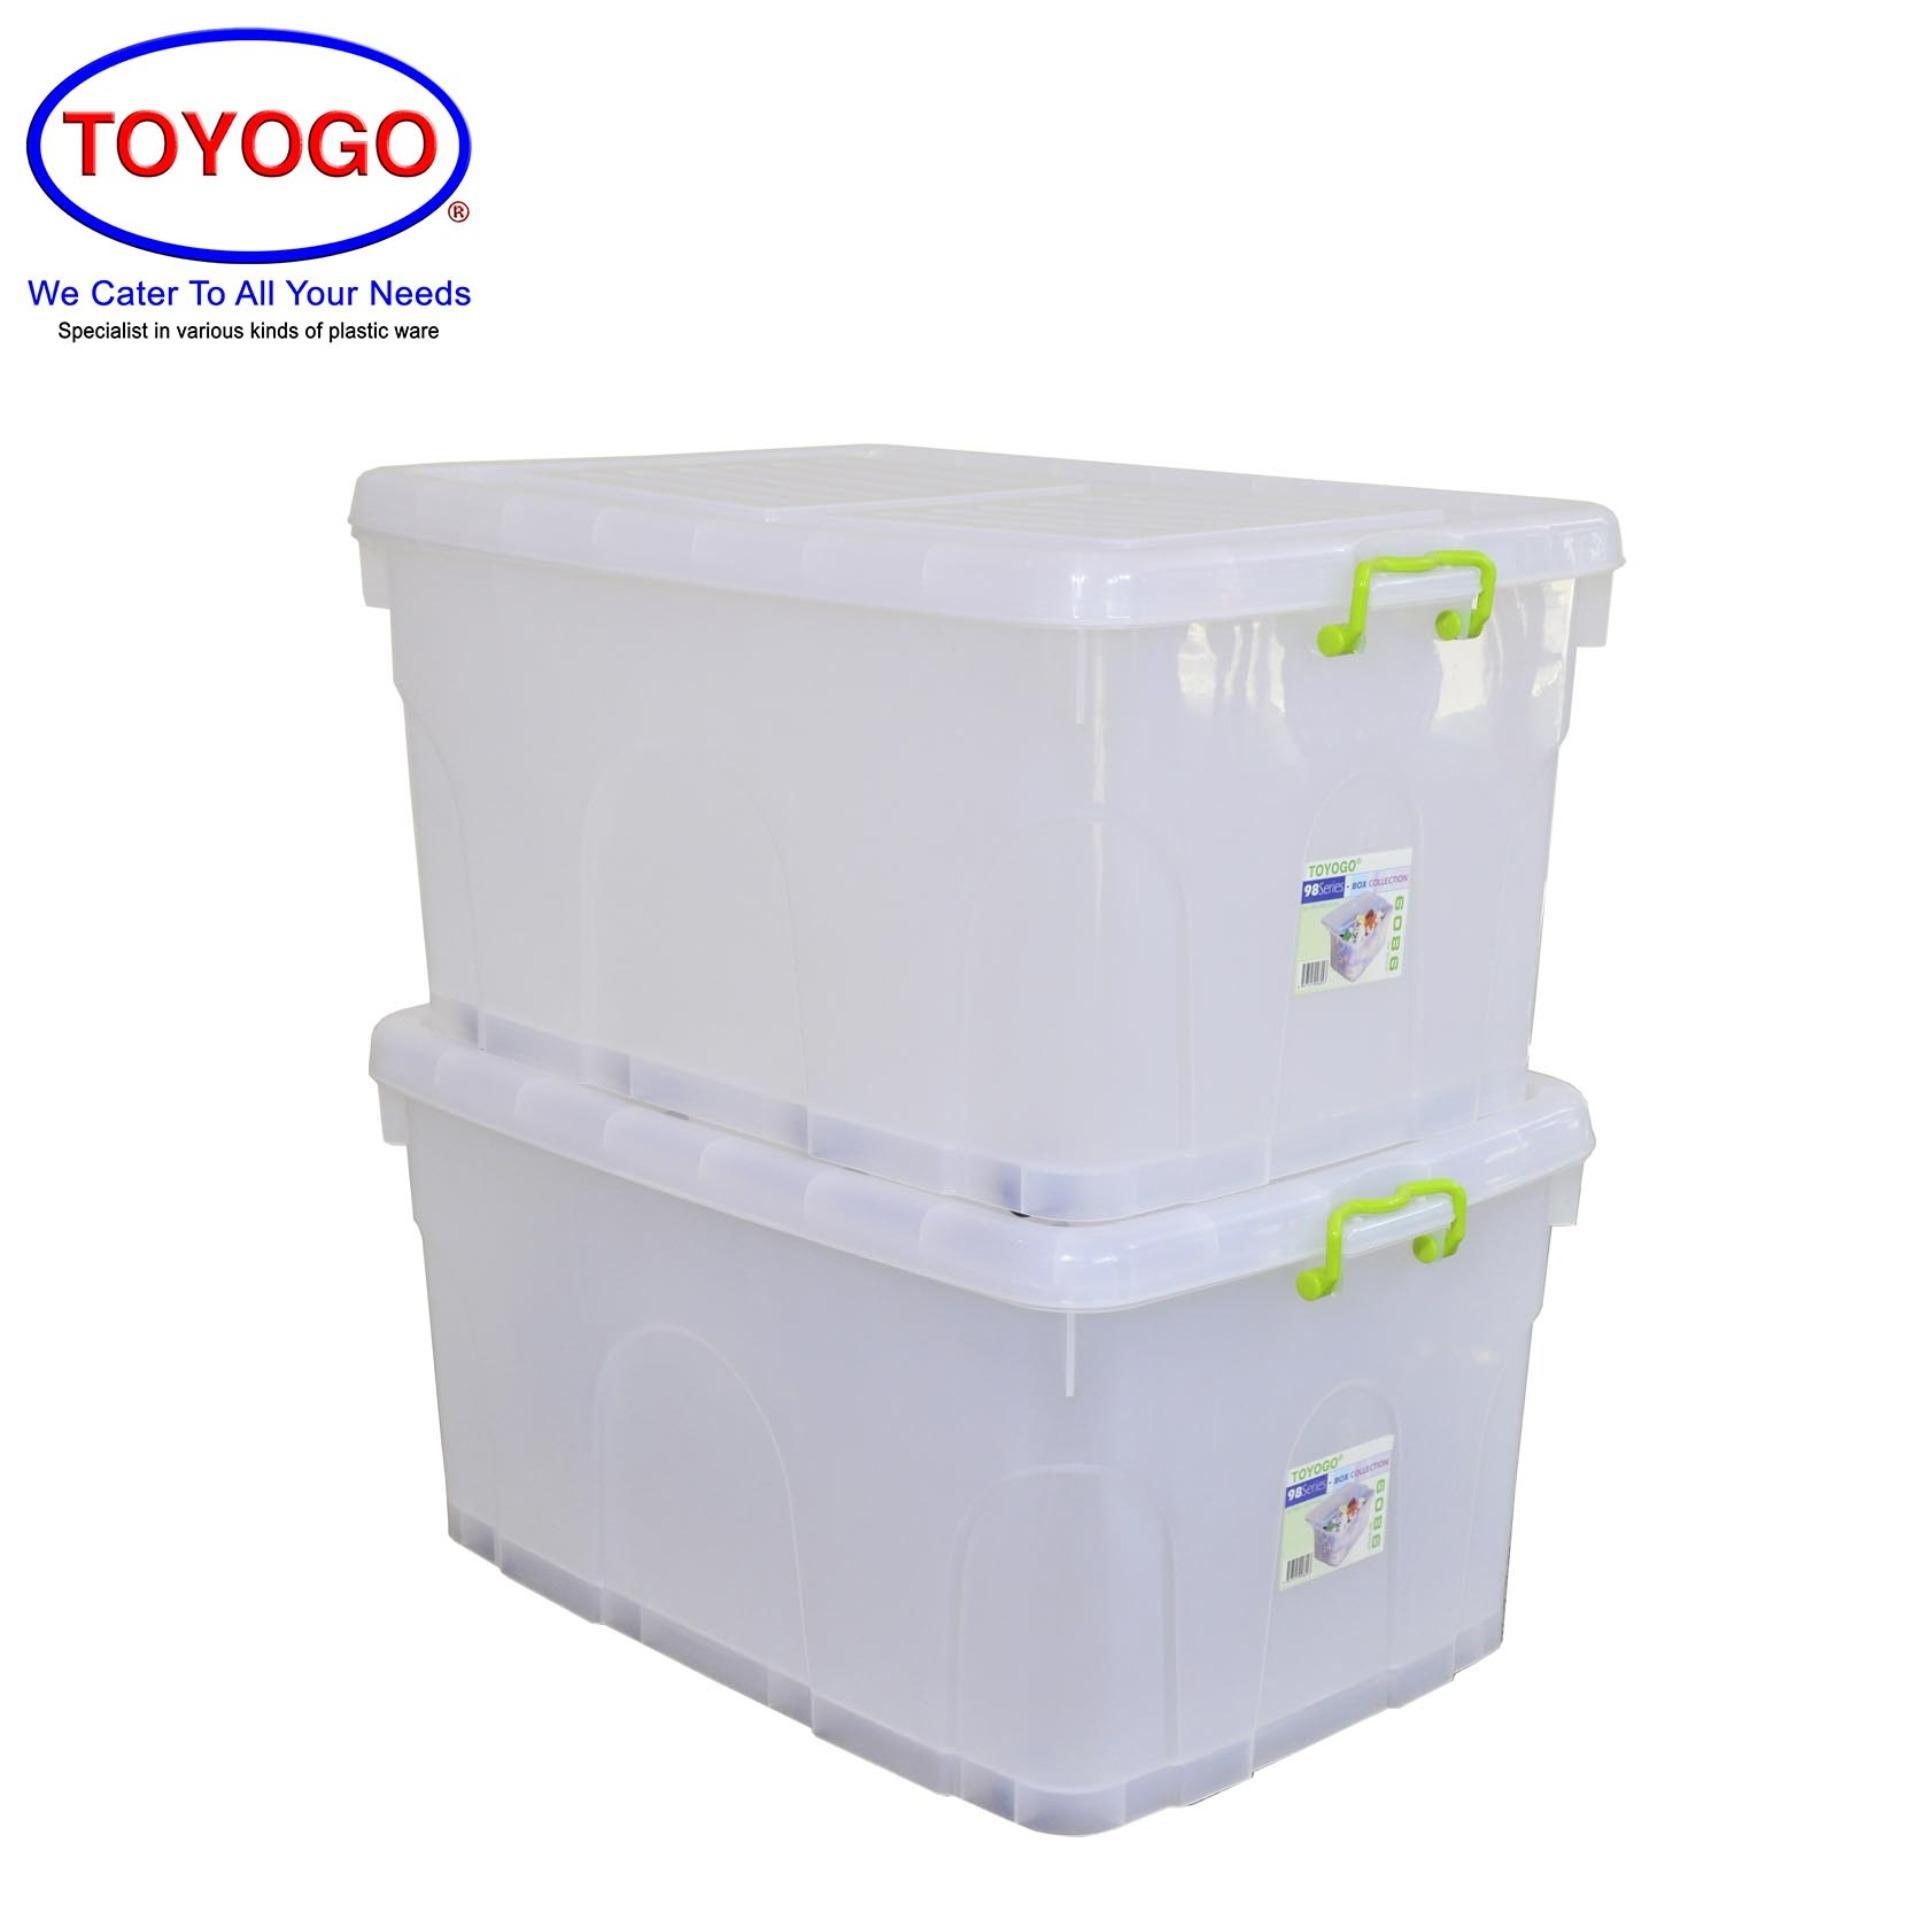 Toyogo Storage Box With Wheels (Bundle of 2) (9809)